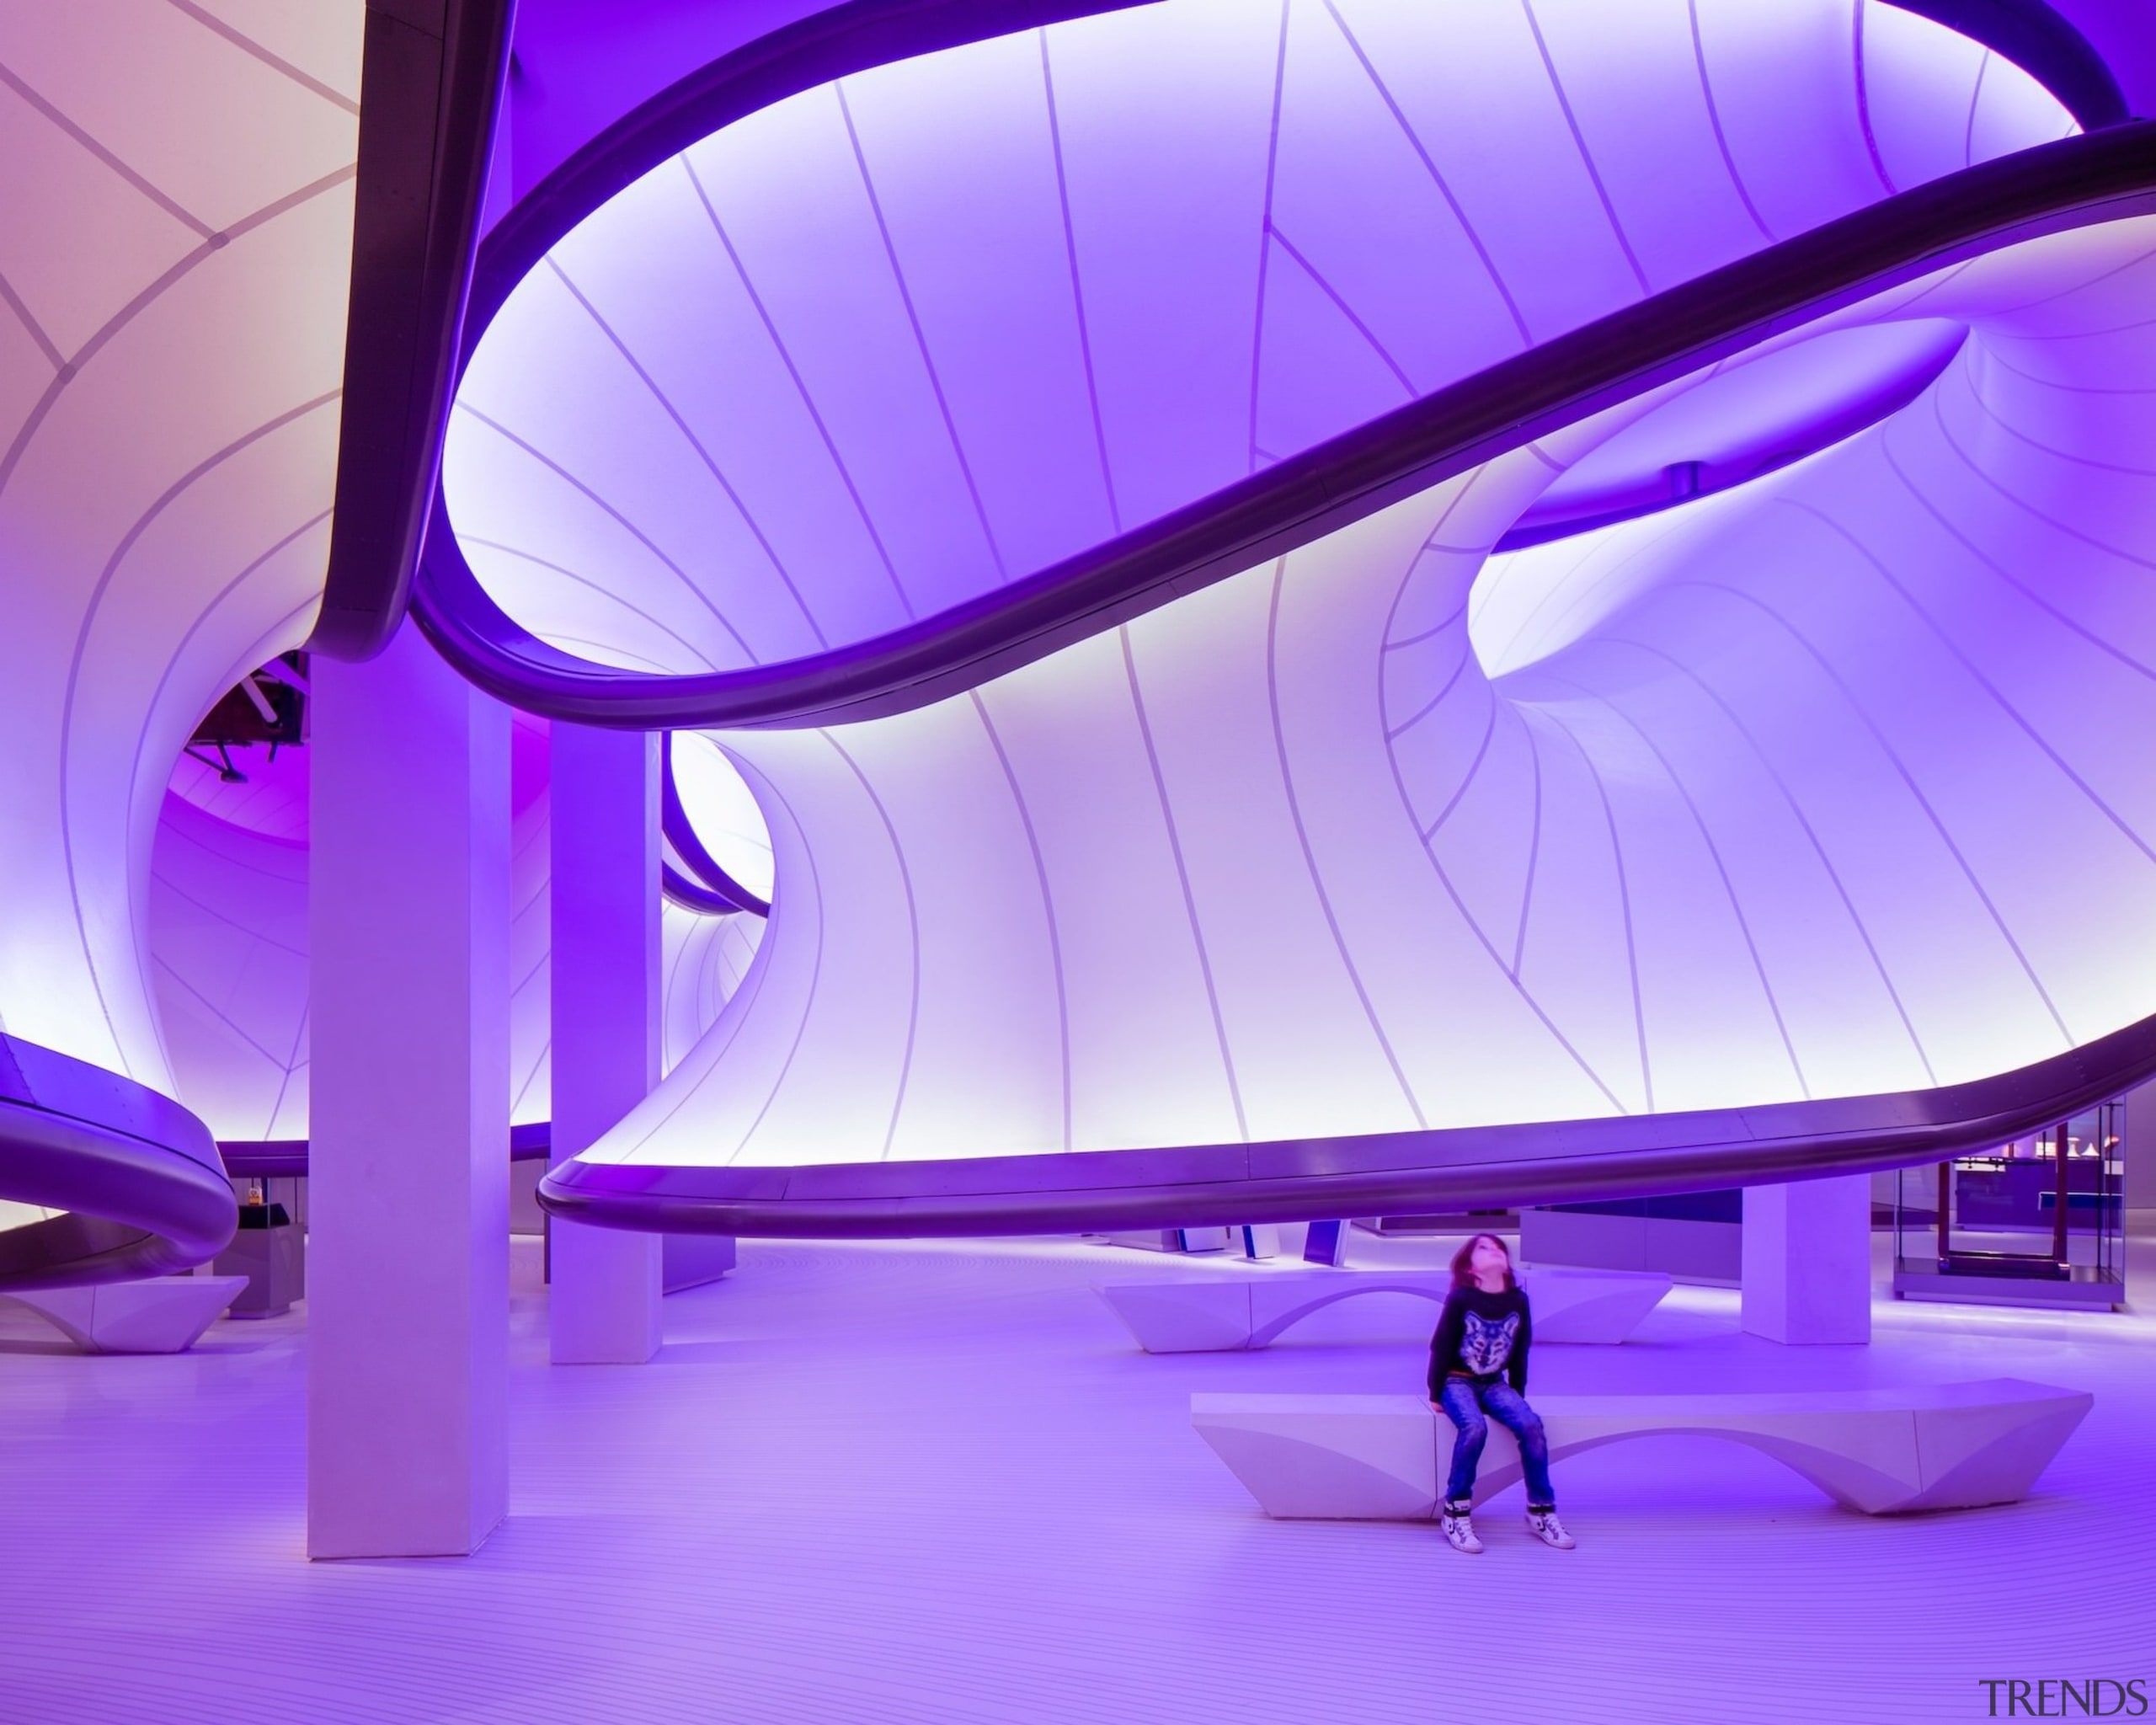 Zaha Hadid – Mathematics: The Winton Gallery – architecture, blue, ceiling, computer wallpaper, daylighting, leisure centre, light, lighting, product design, purple, structure, purple